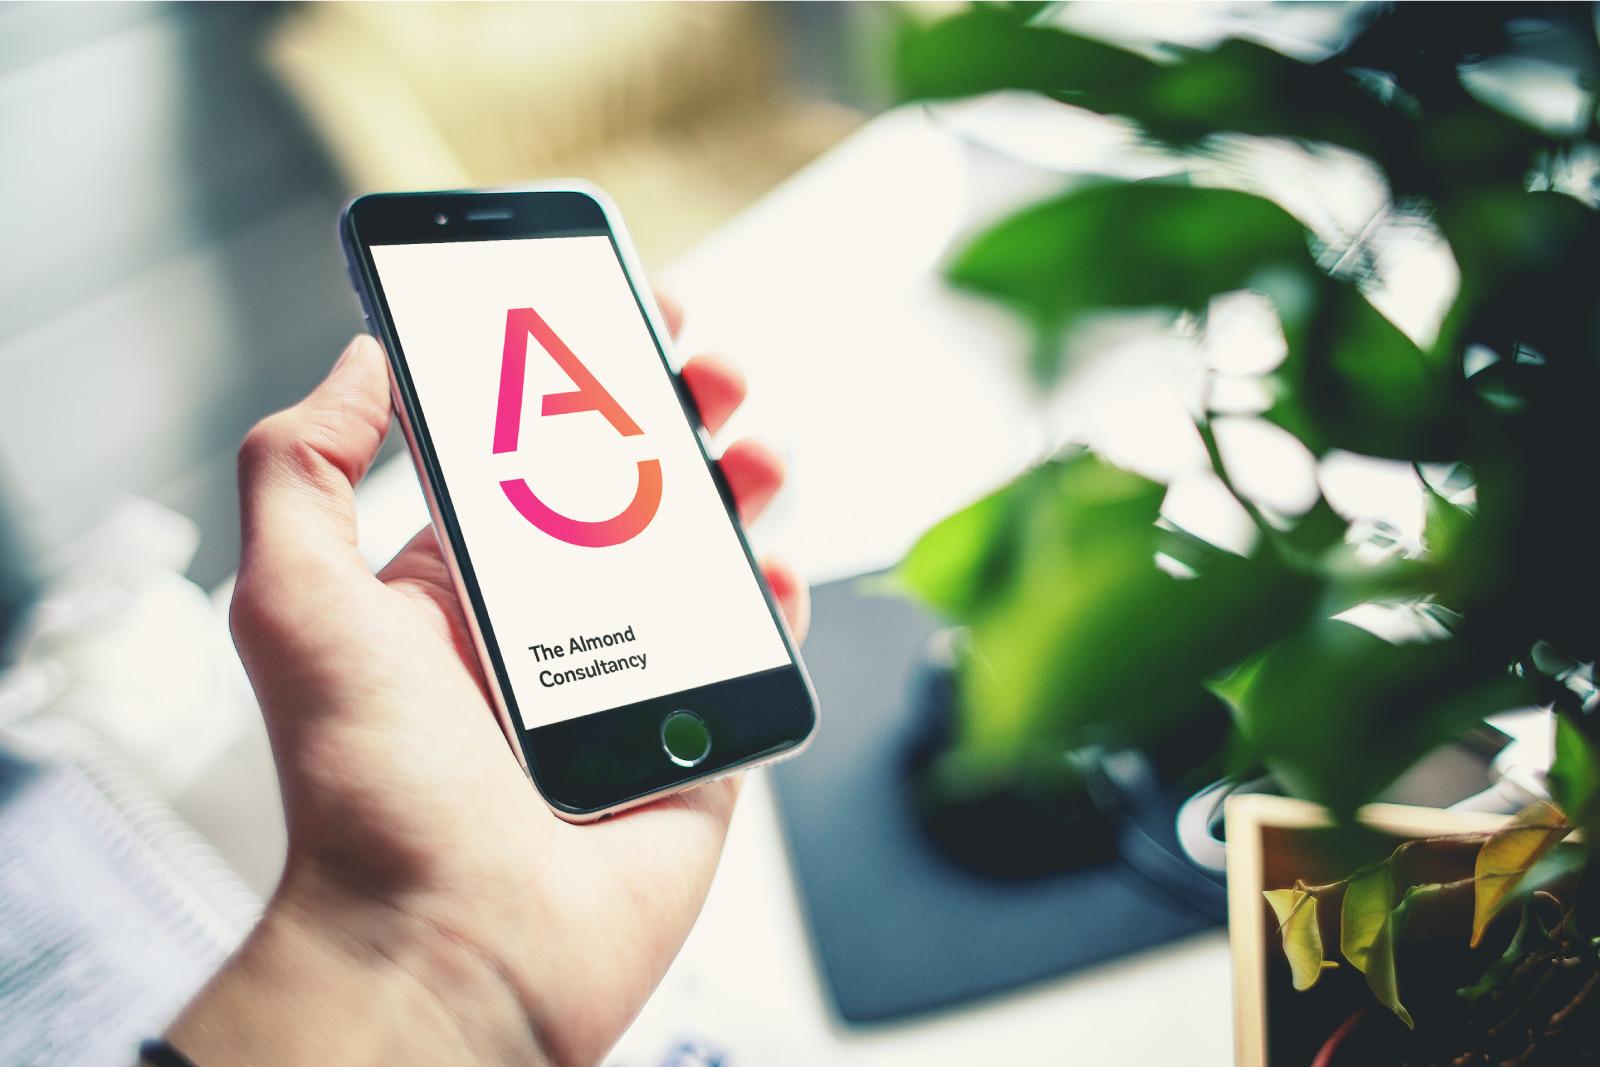 almond logo on smartphone